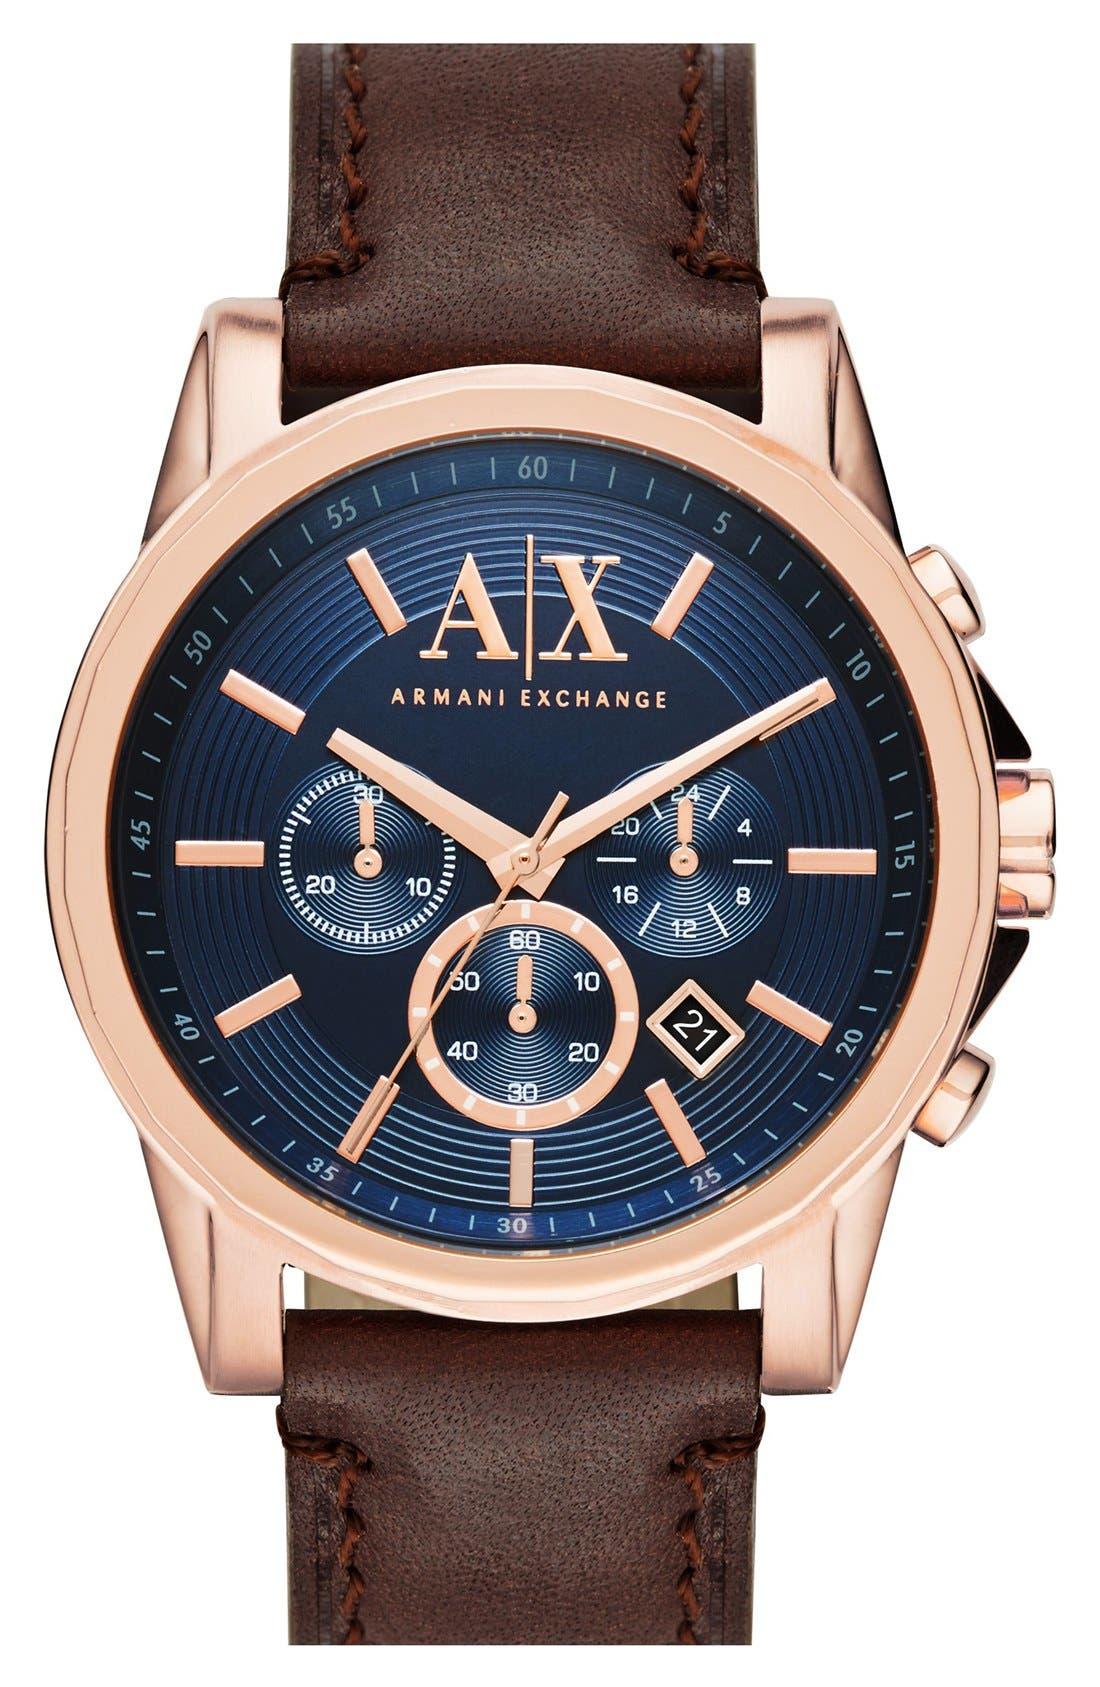 AX ARMANI EXCHANGE Chronograph Leather Strap, 45mm